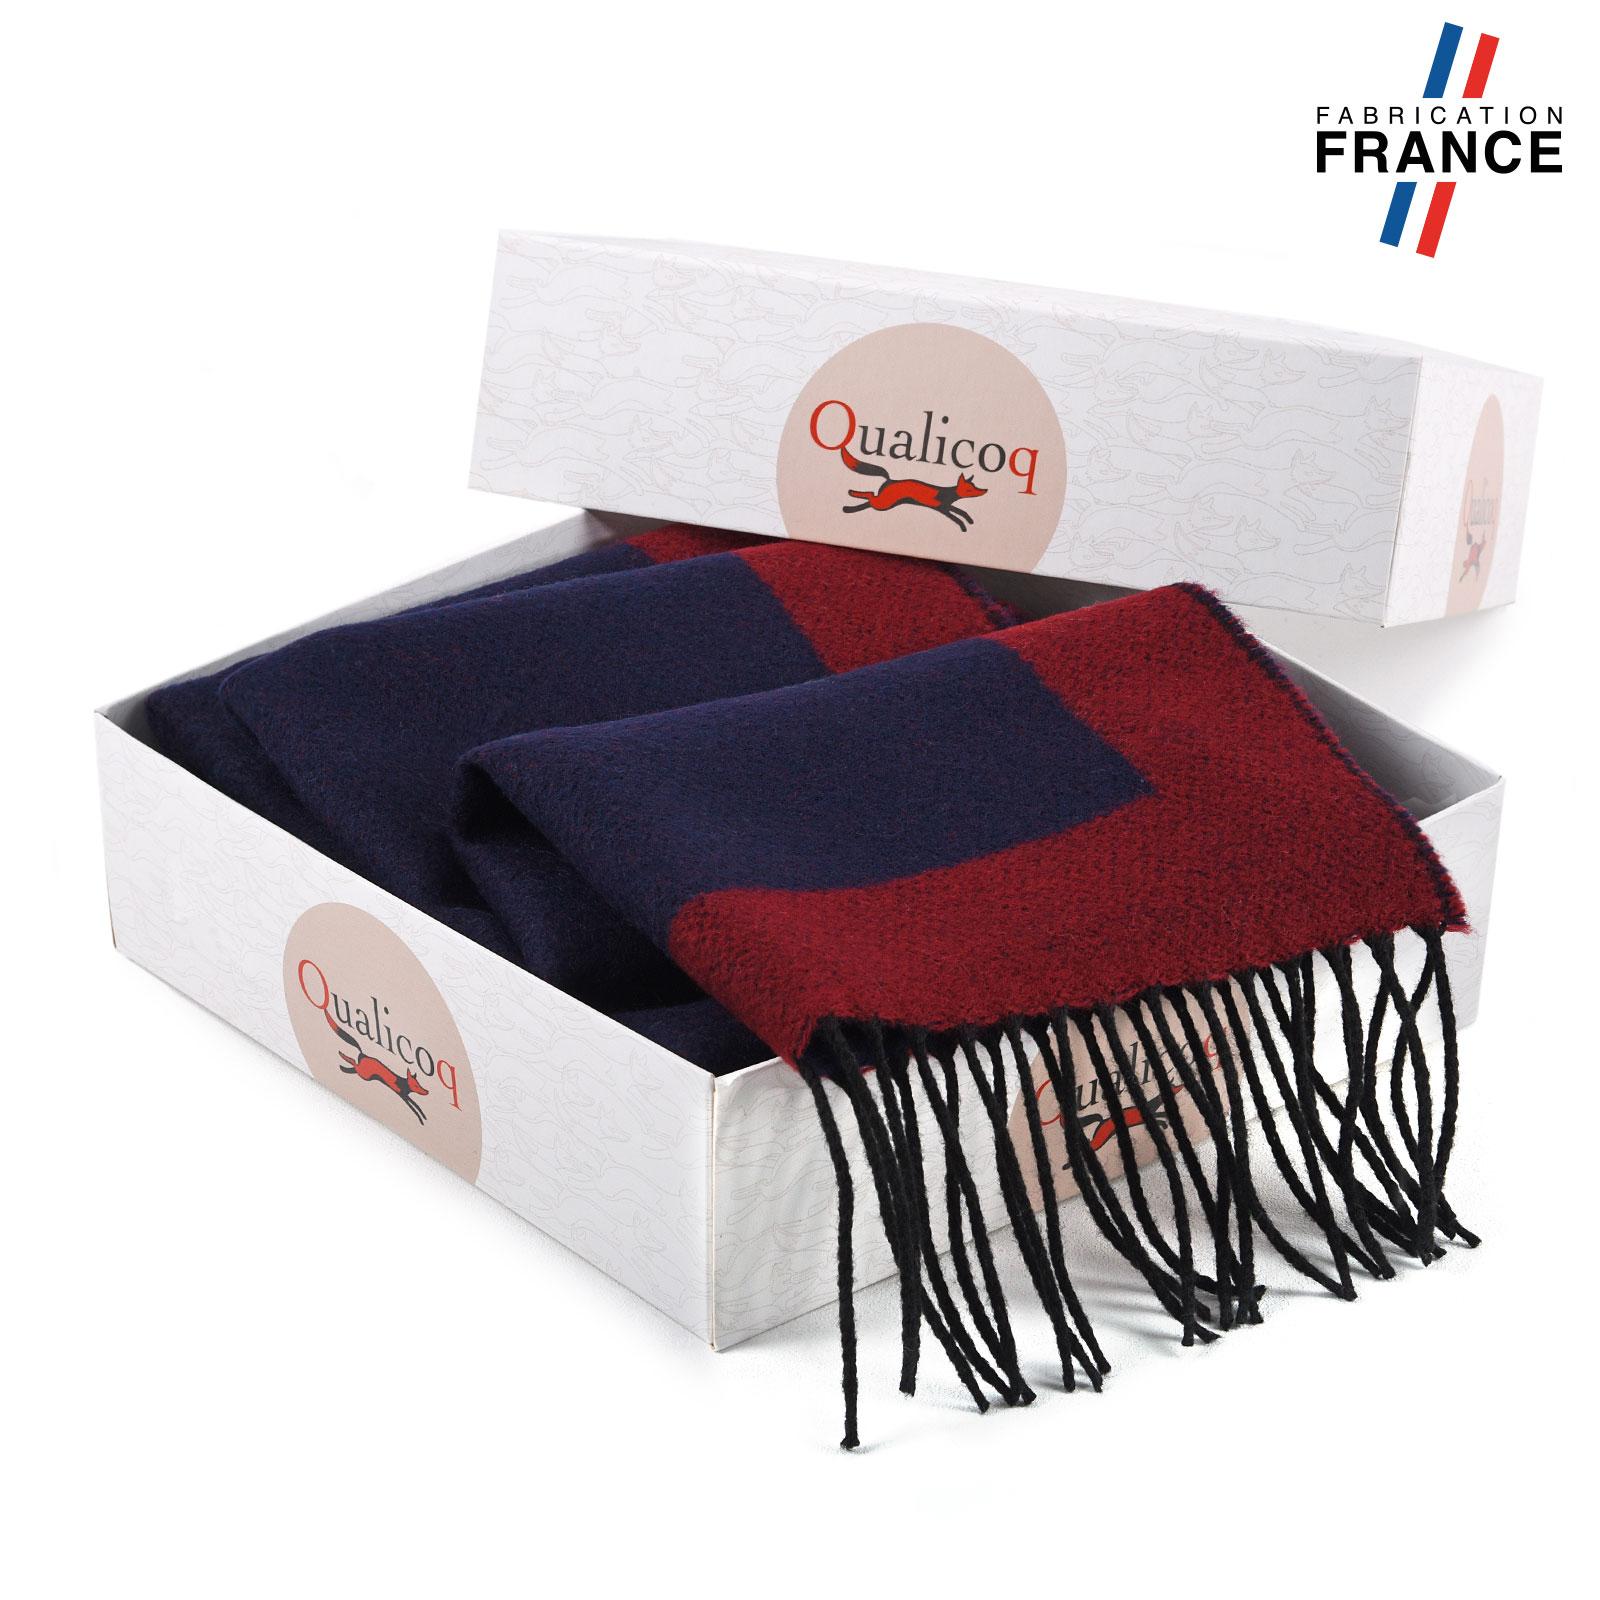 AT-03743-coffret-cadeau-echarpe-marine-rouge-B16